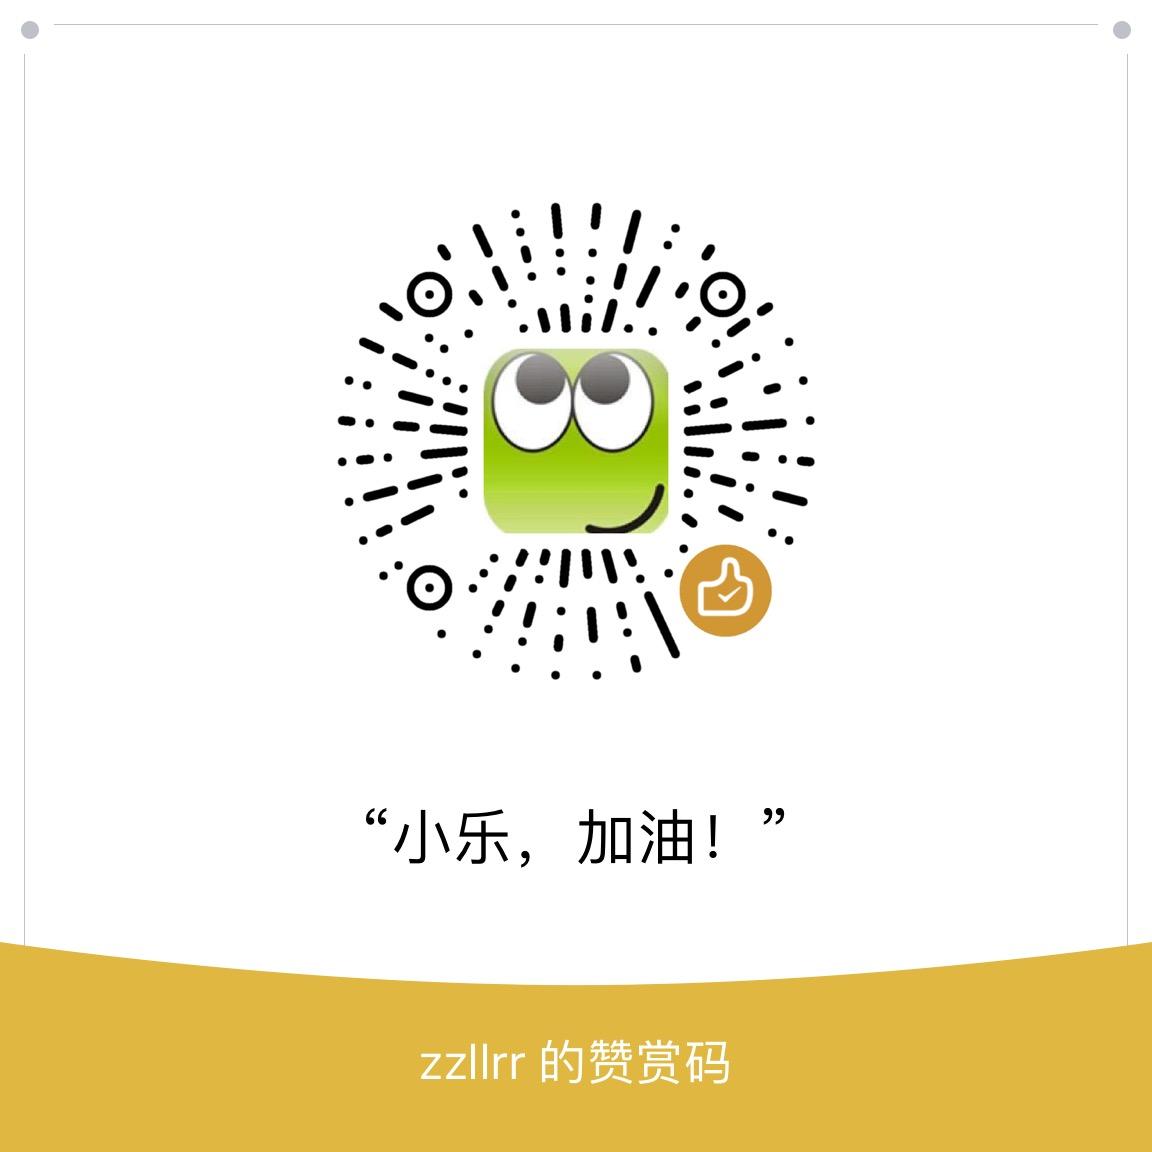 Donate zzllrr via Wechat